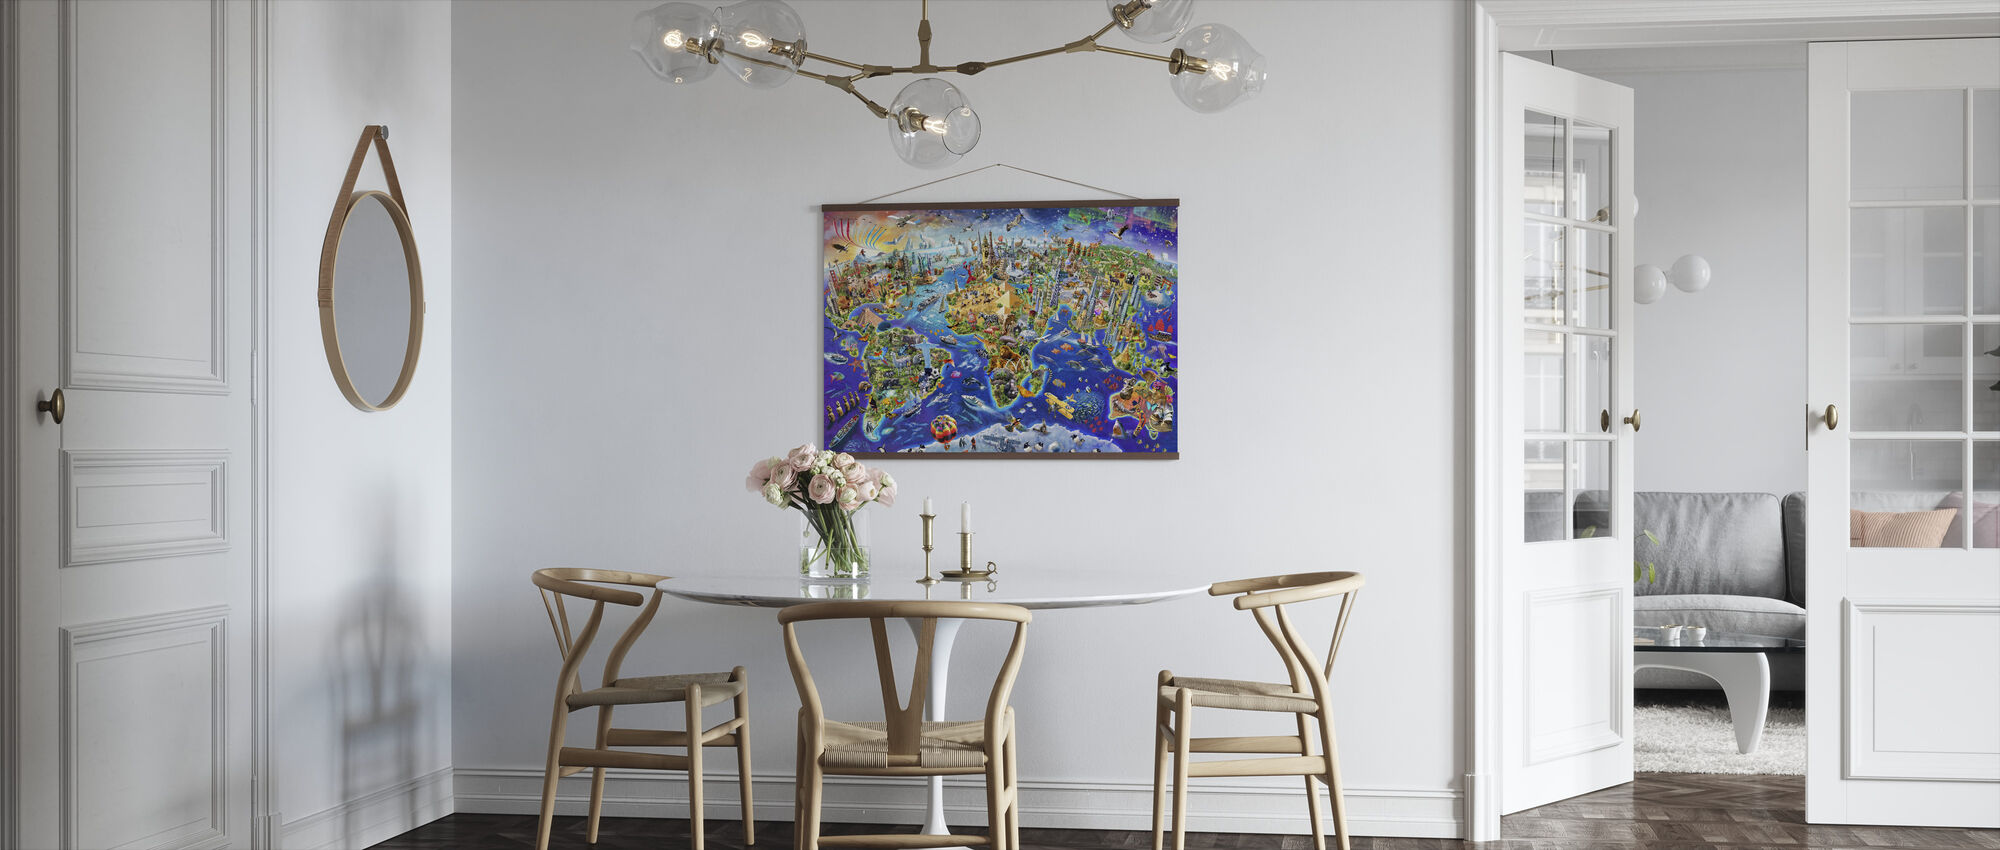 Gekke Wereld - Poster - Keuken